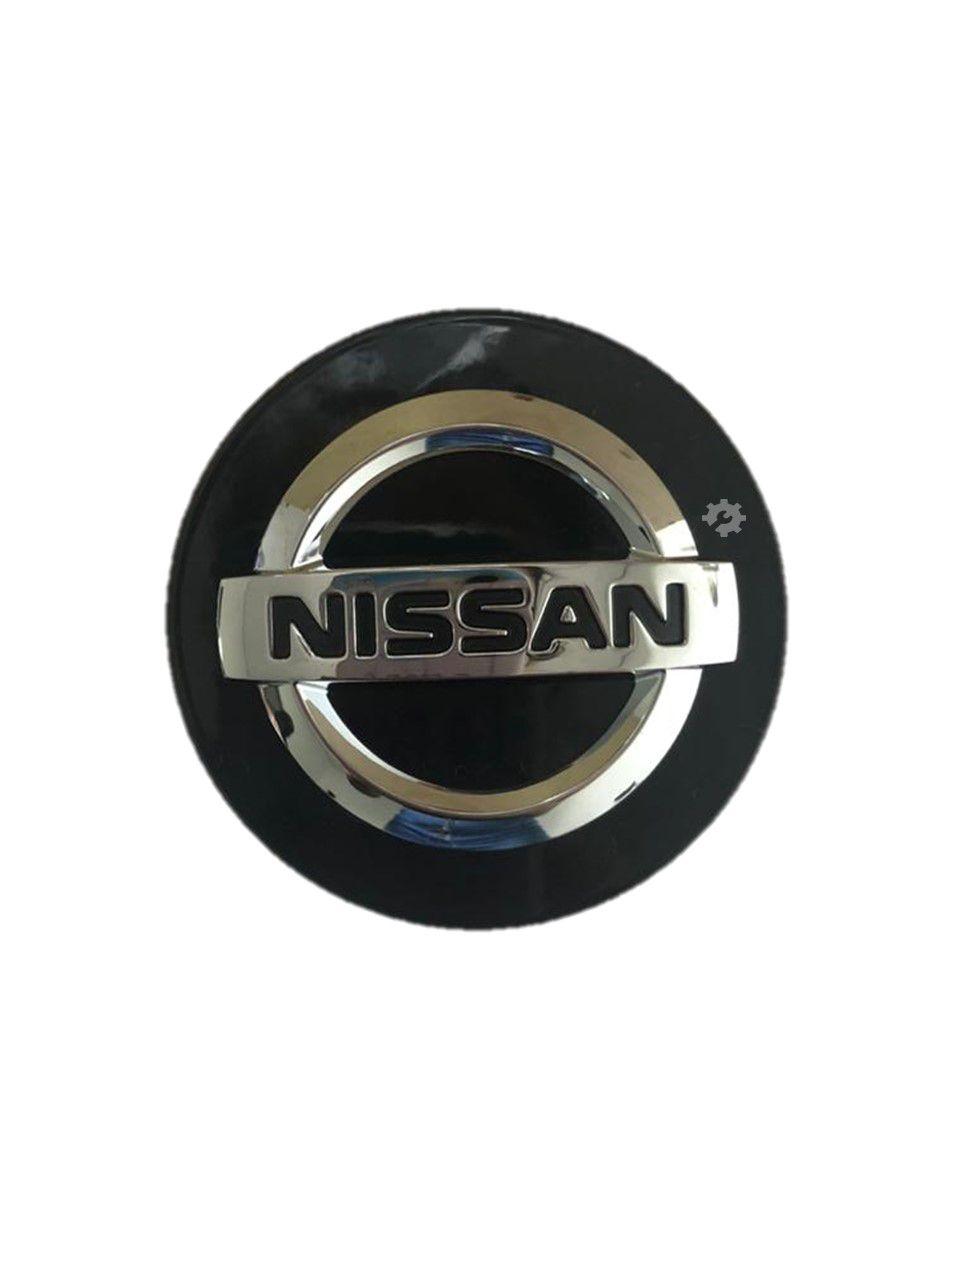 Calota Roda Nissan Versa Kicks 2014 2015 2016 2017 Original